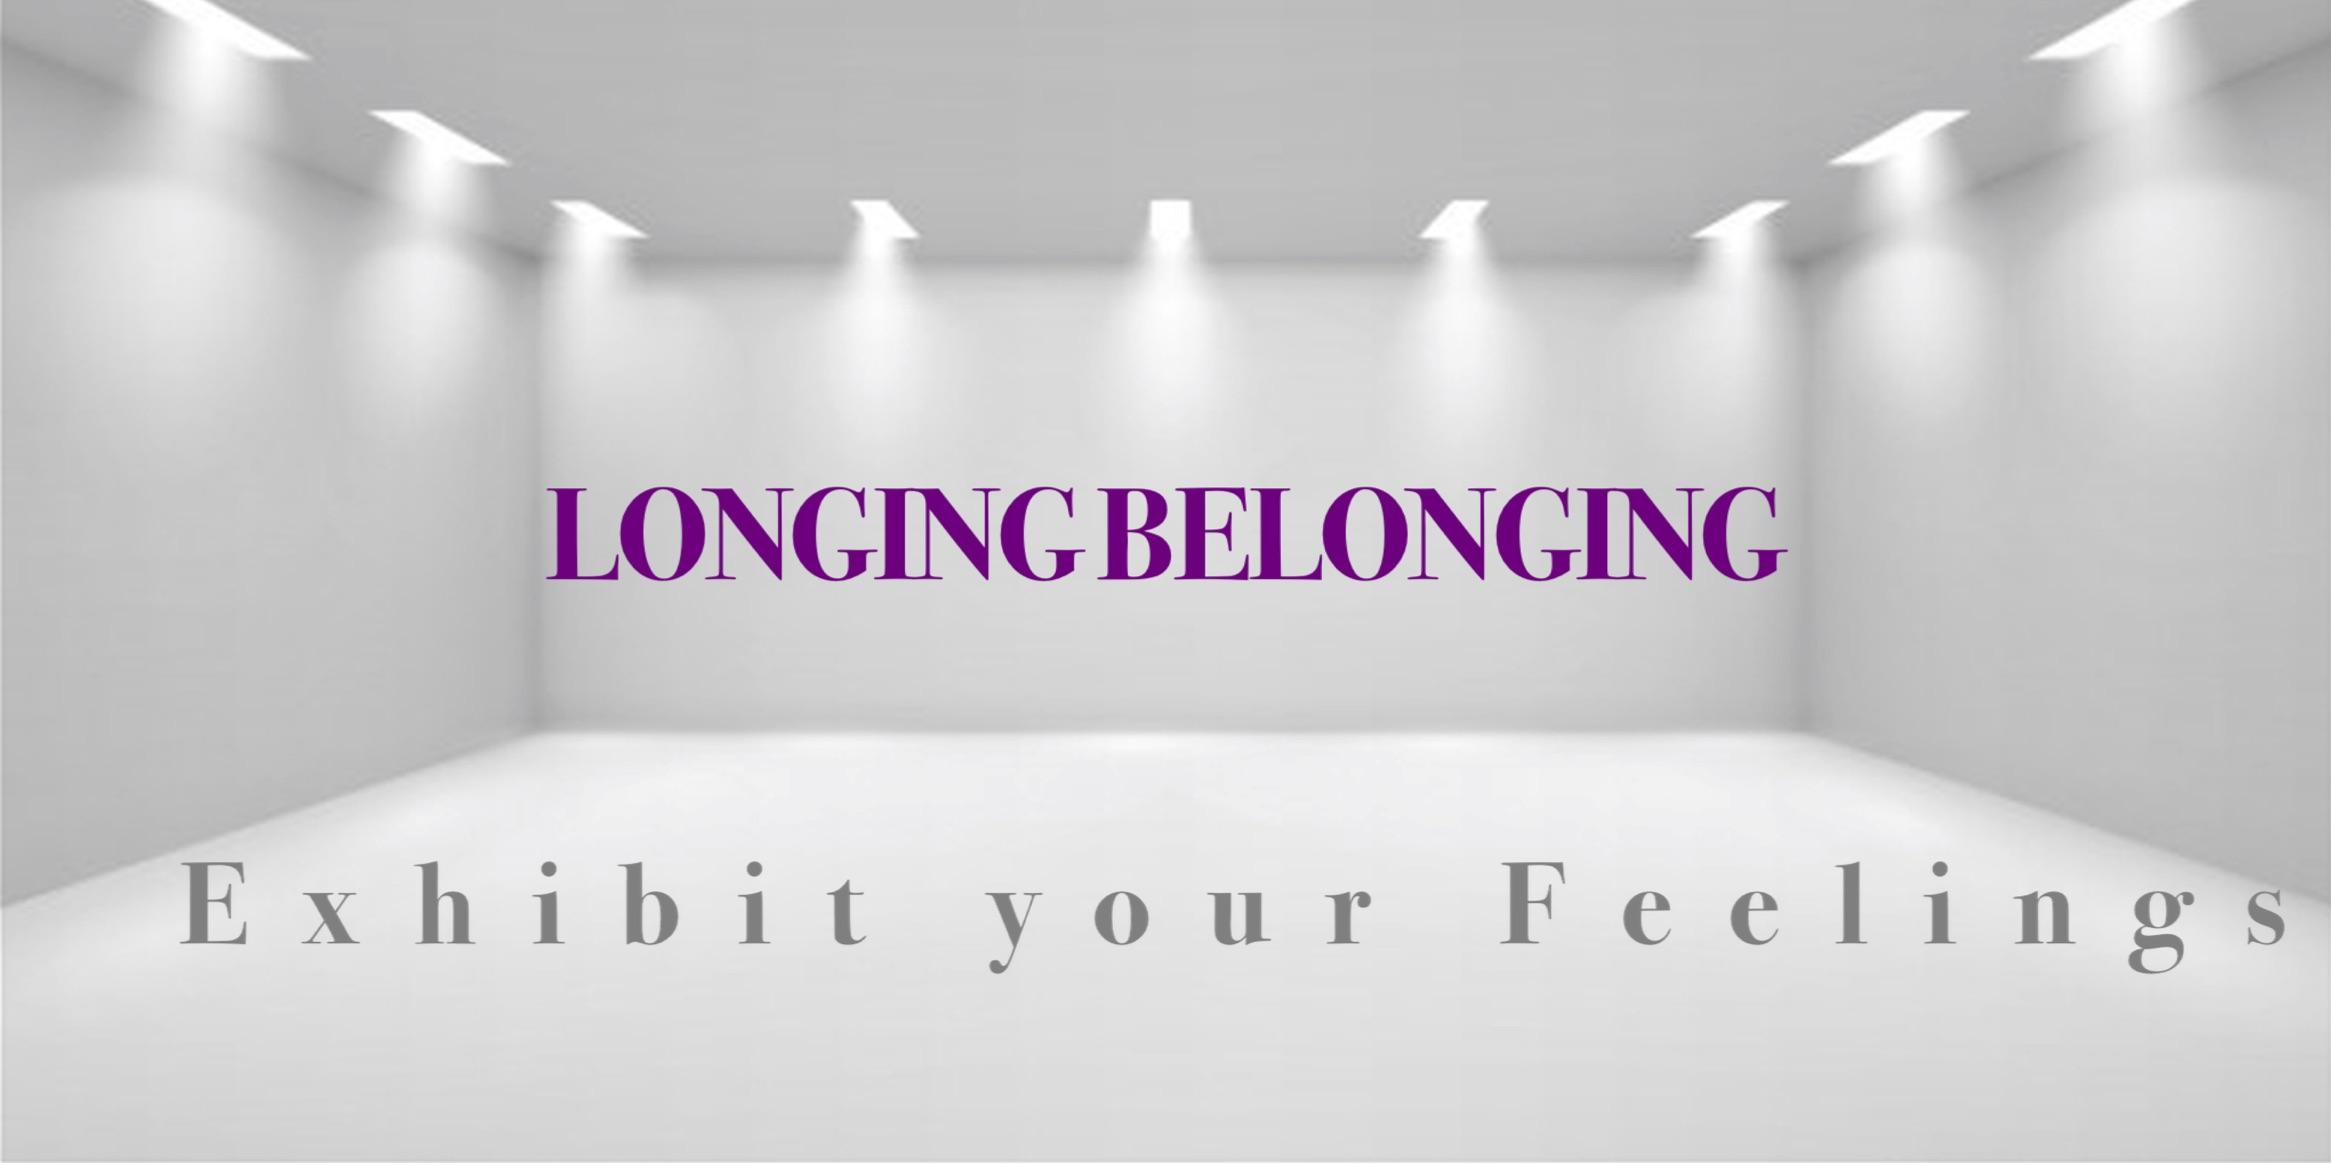 2021_Longing Belonging_BarLin orizzontal